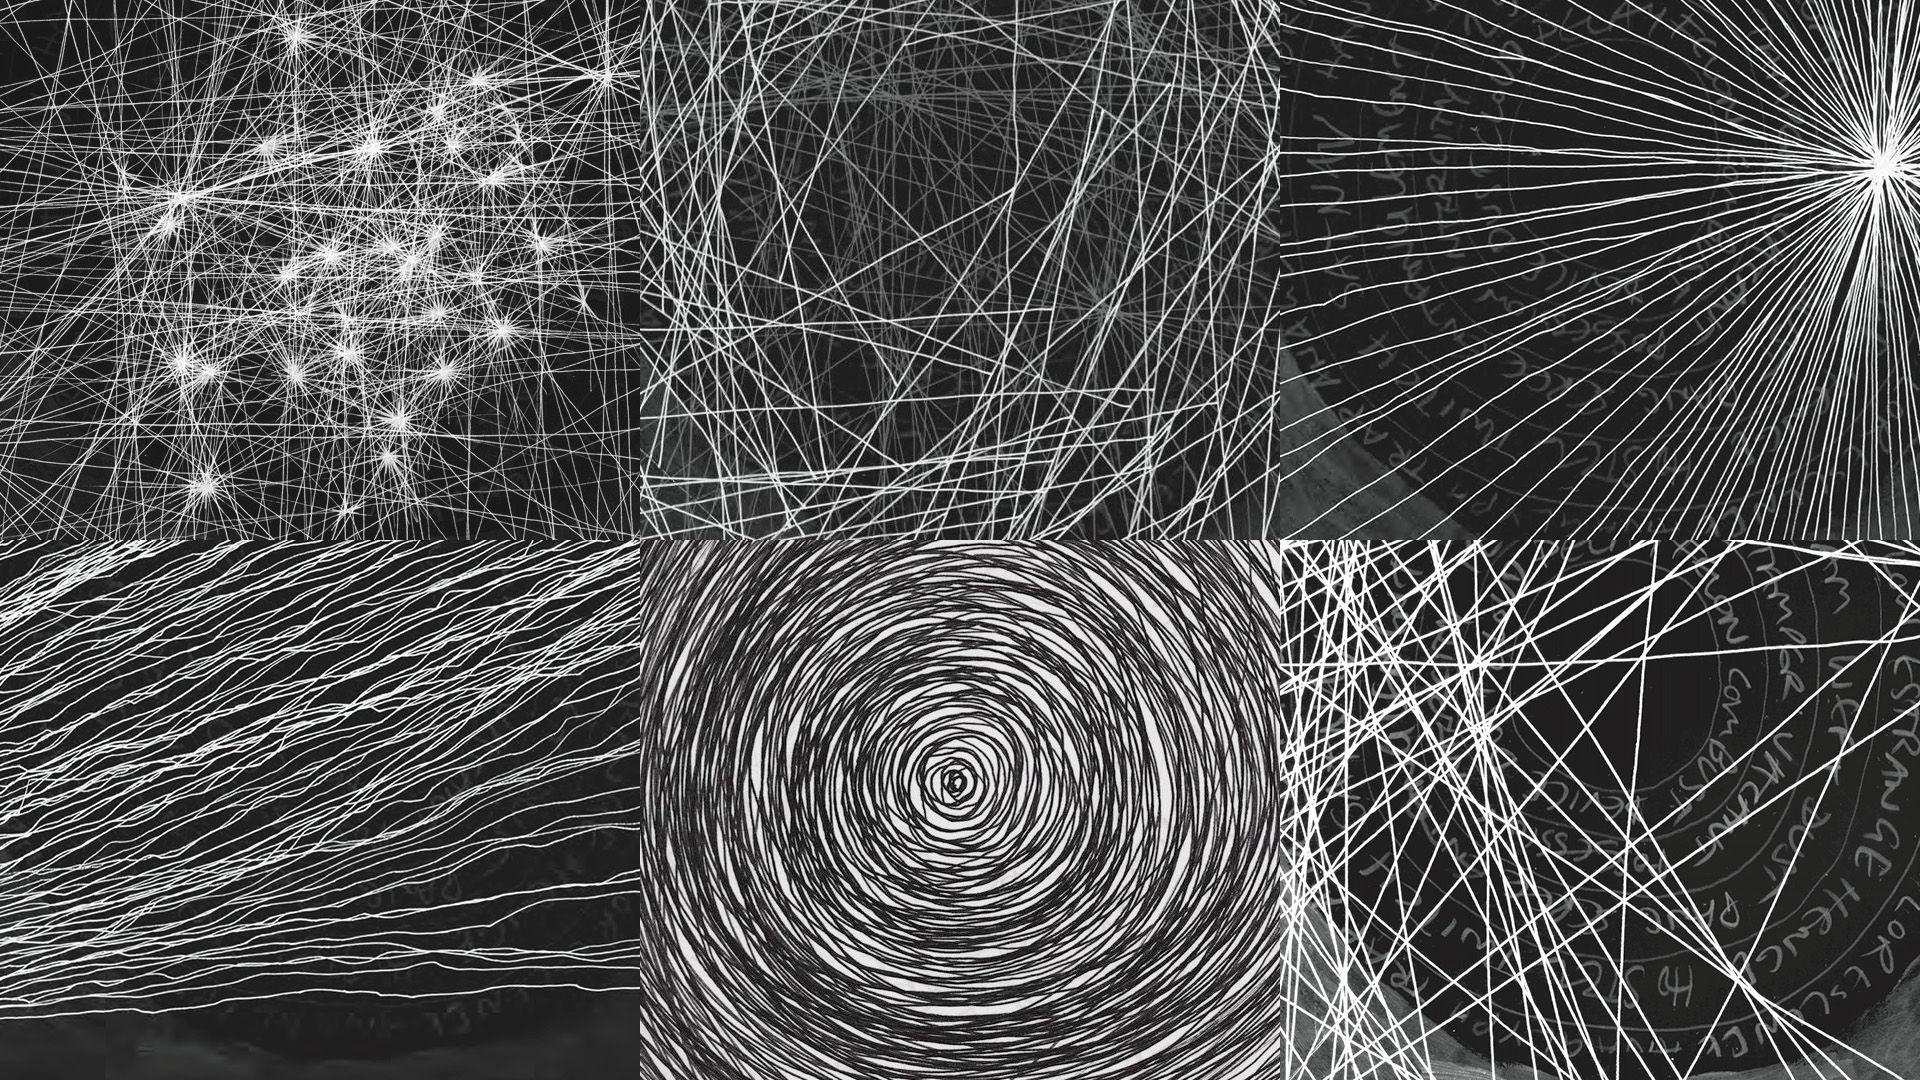 Download Radiohead Wallpaper Hd Backgrounds Download Itl Cat